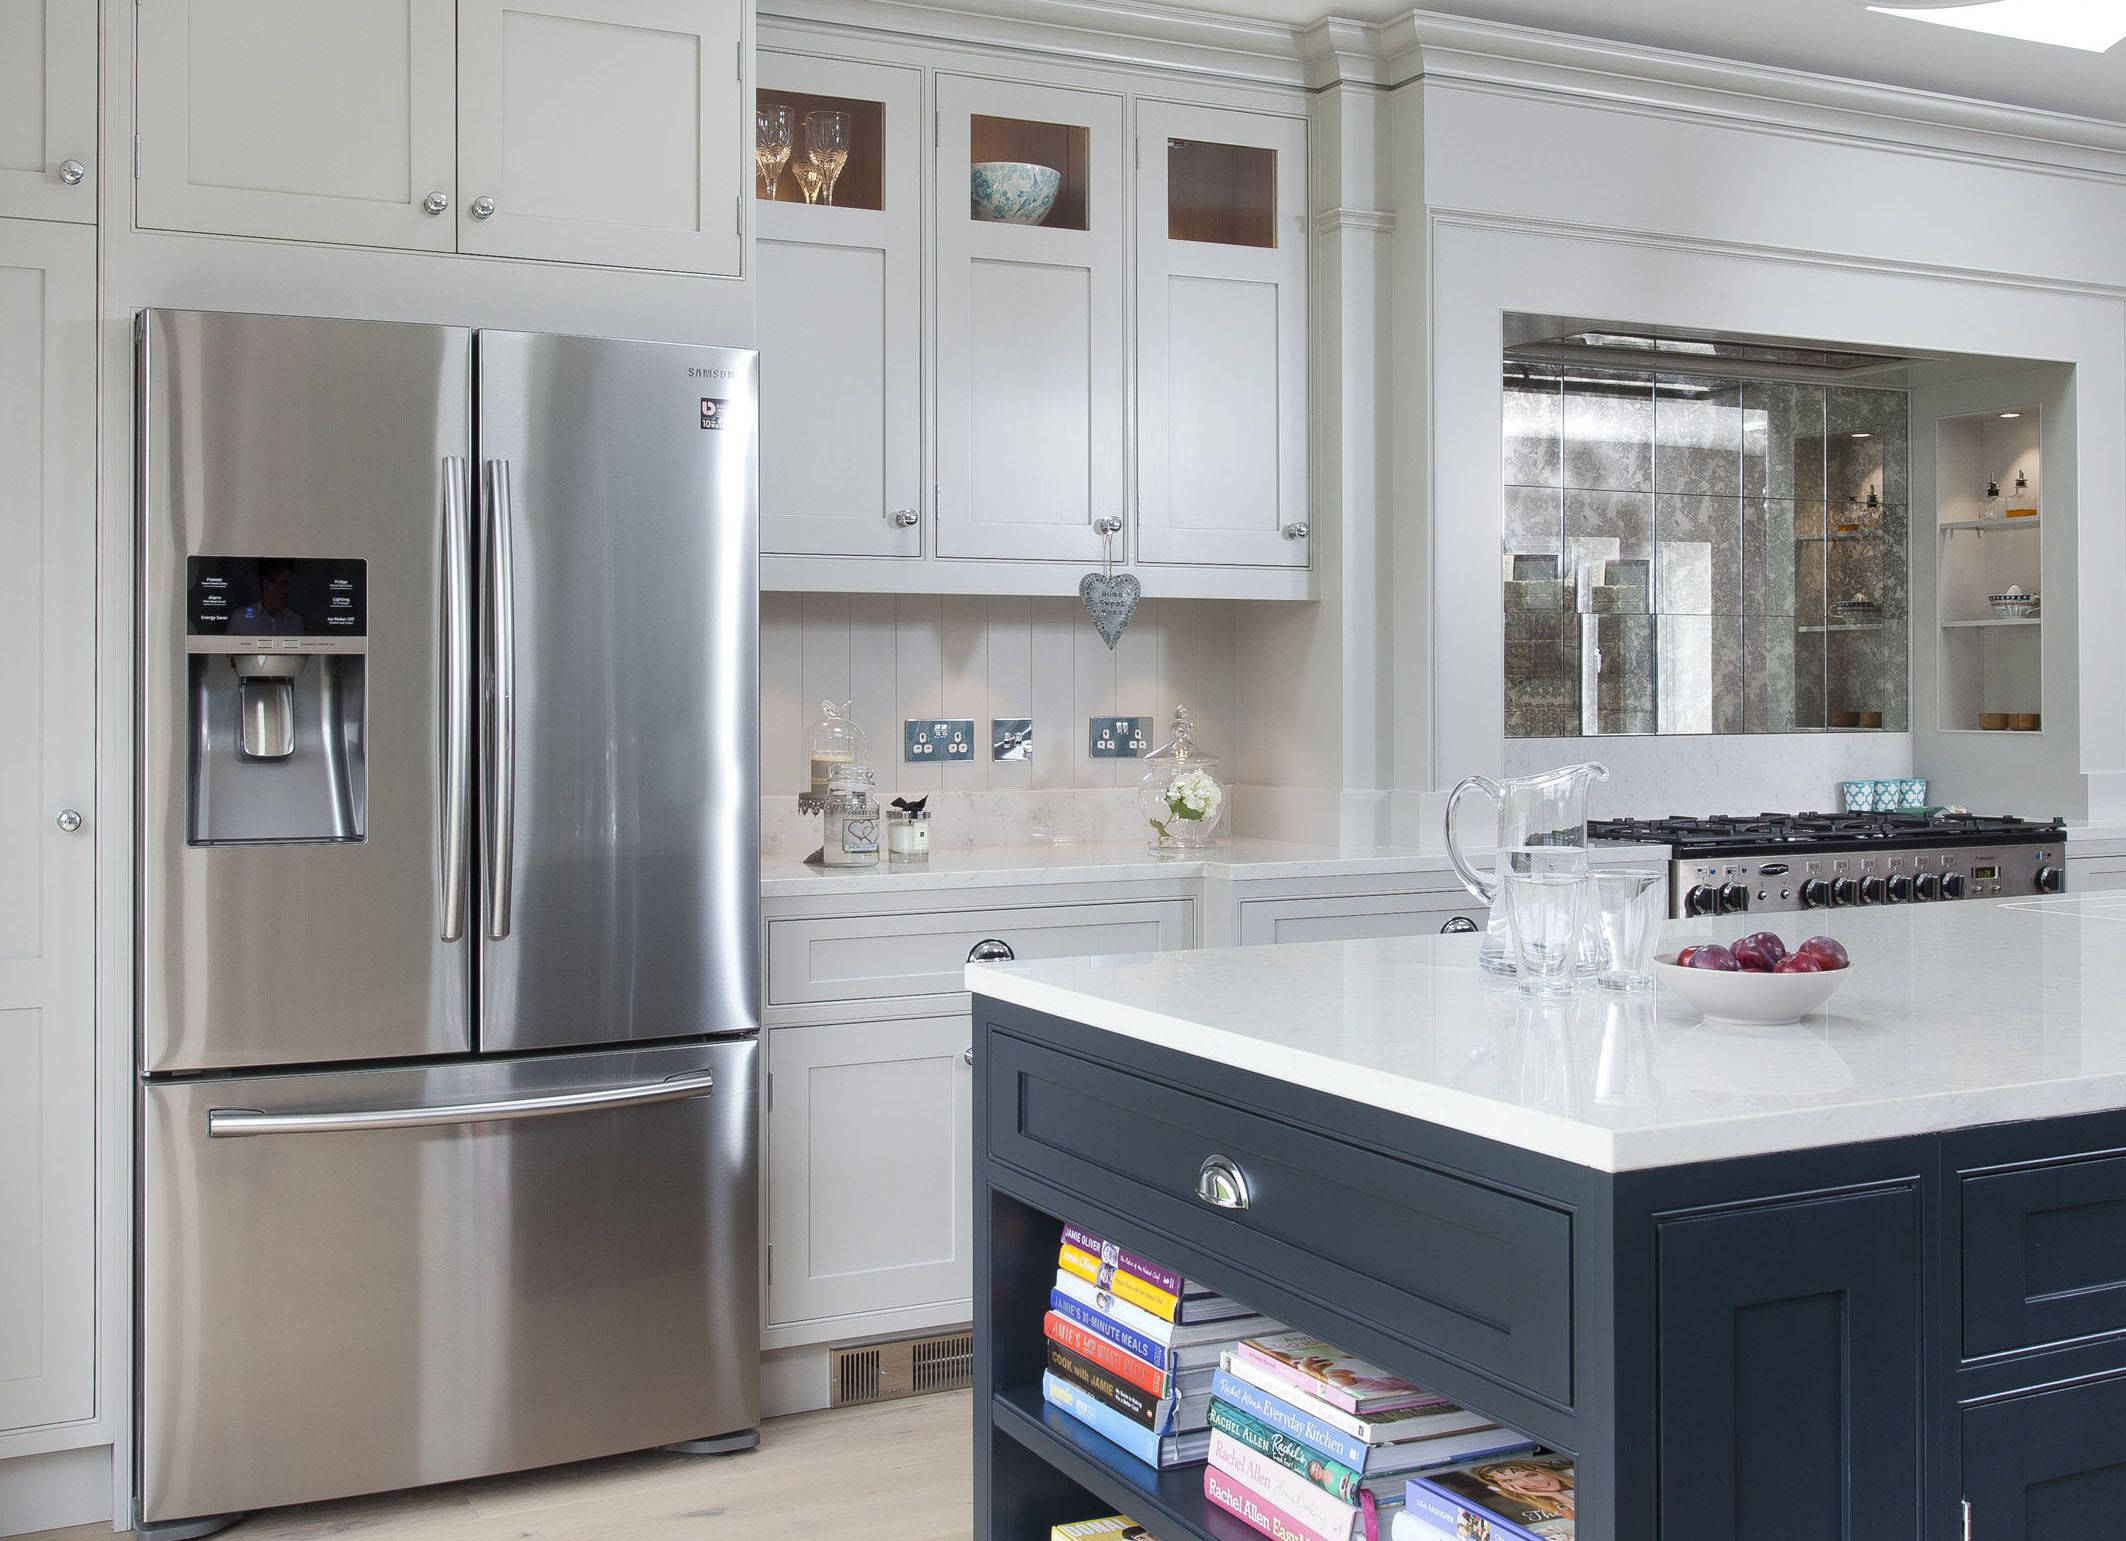 30mm inframe handmade kitchen by woodale handpainted in little rh pinterest com